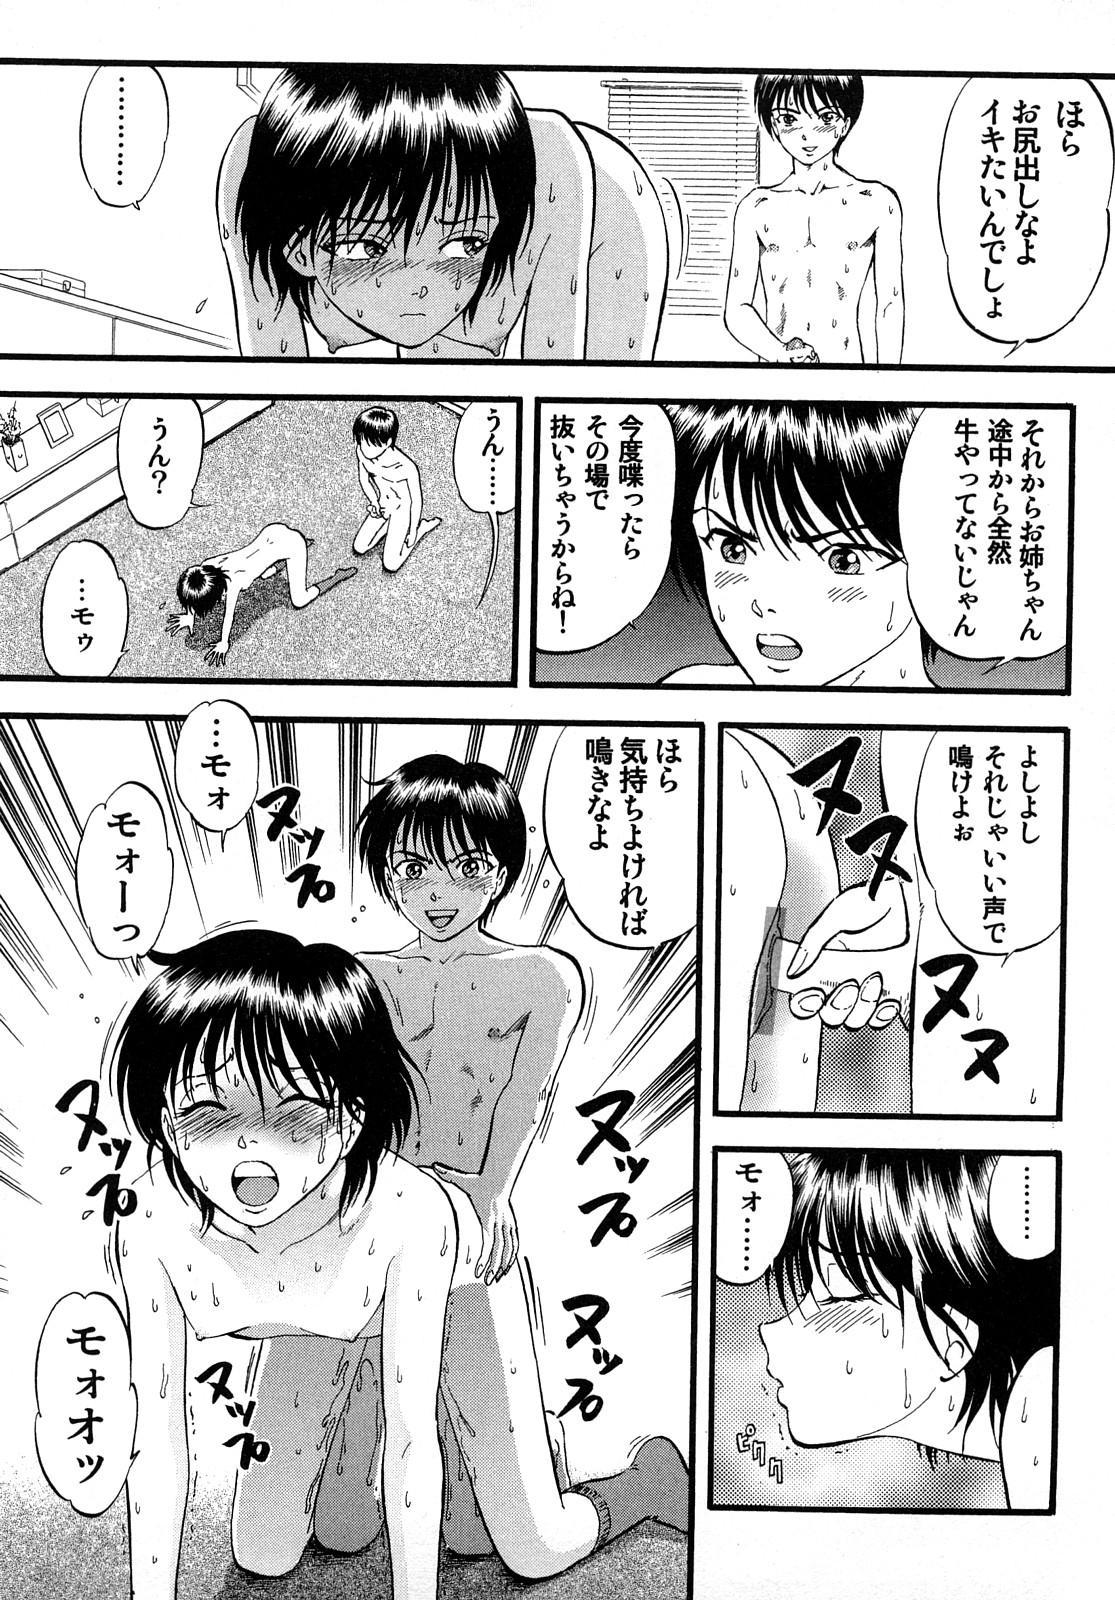 R Shitei Jou 38